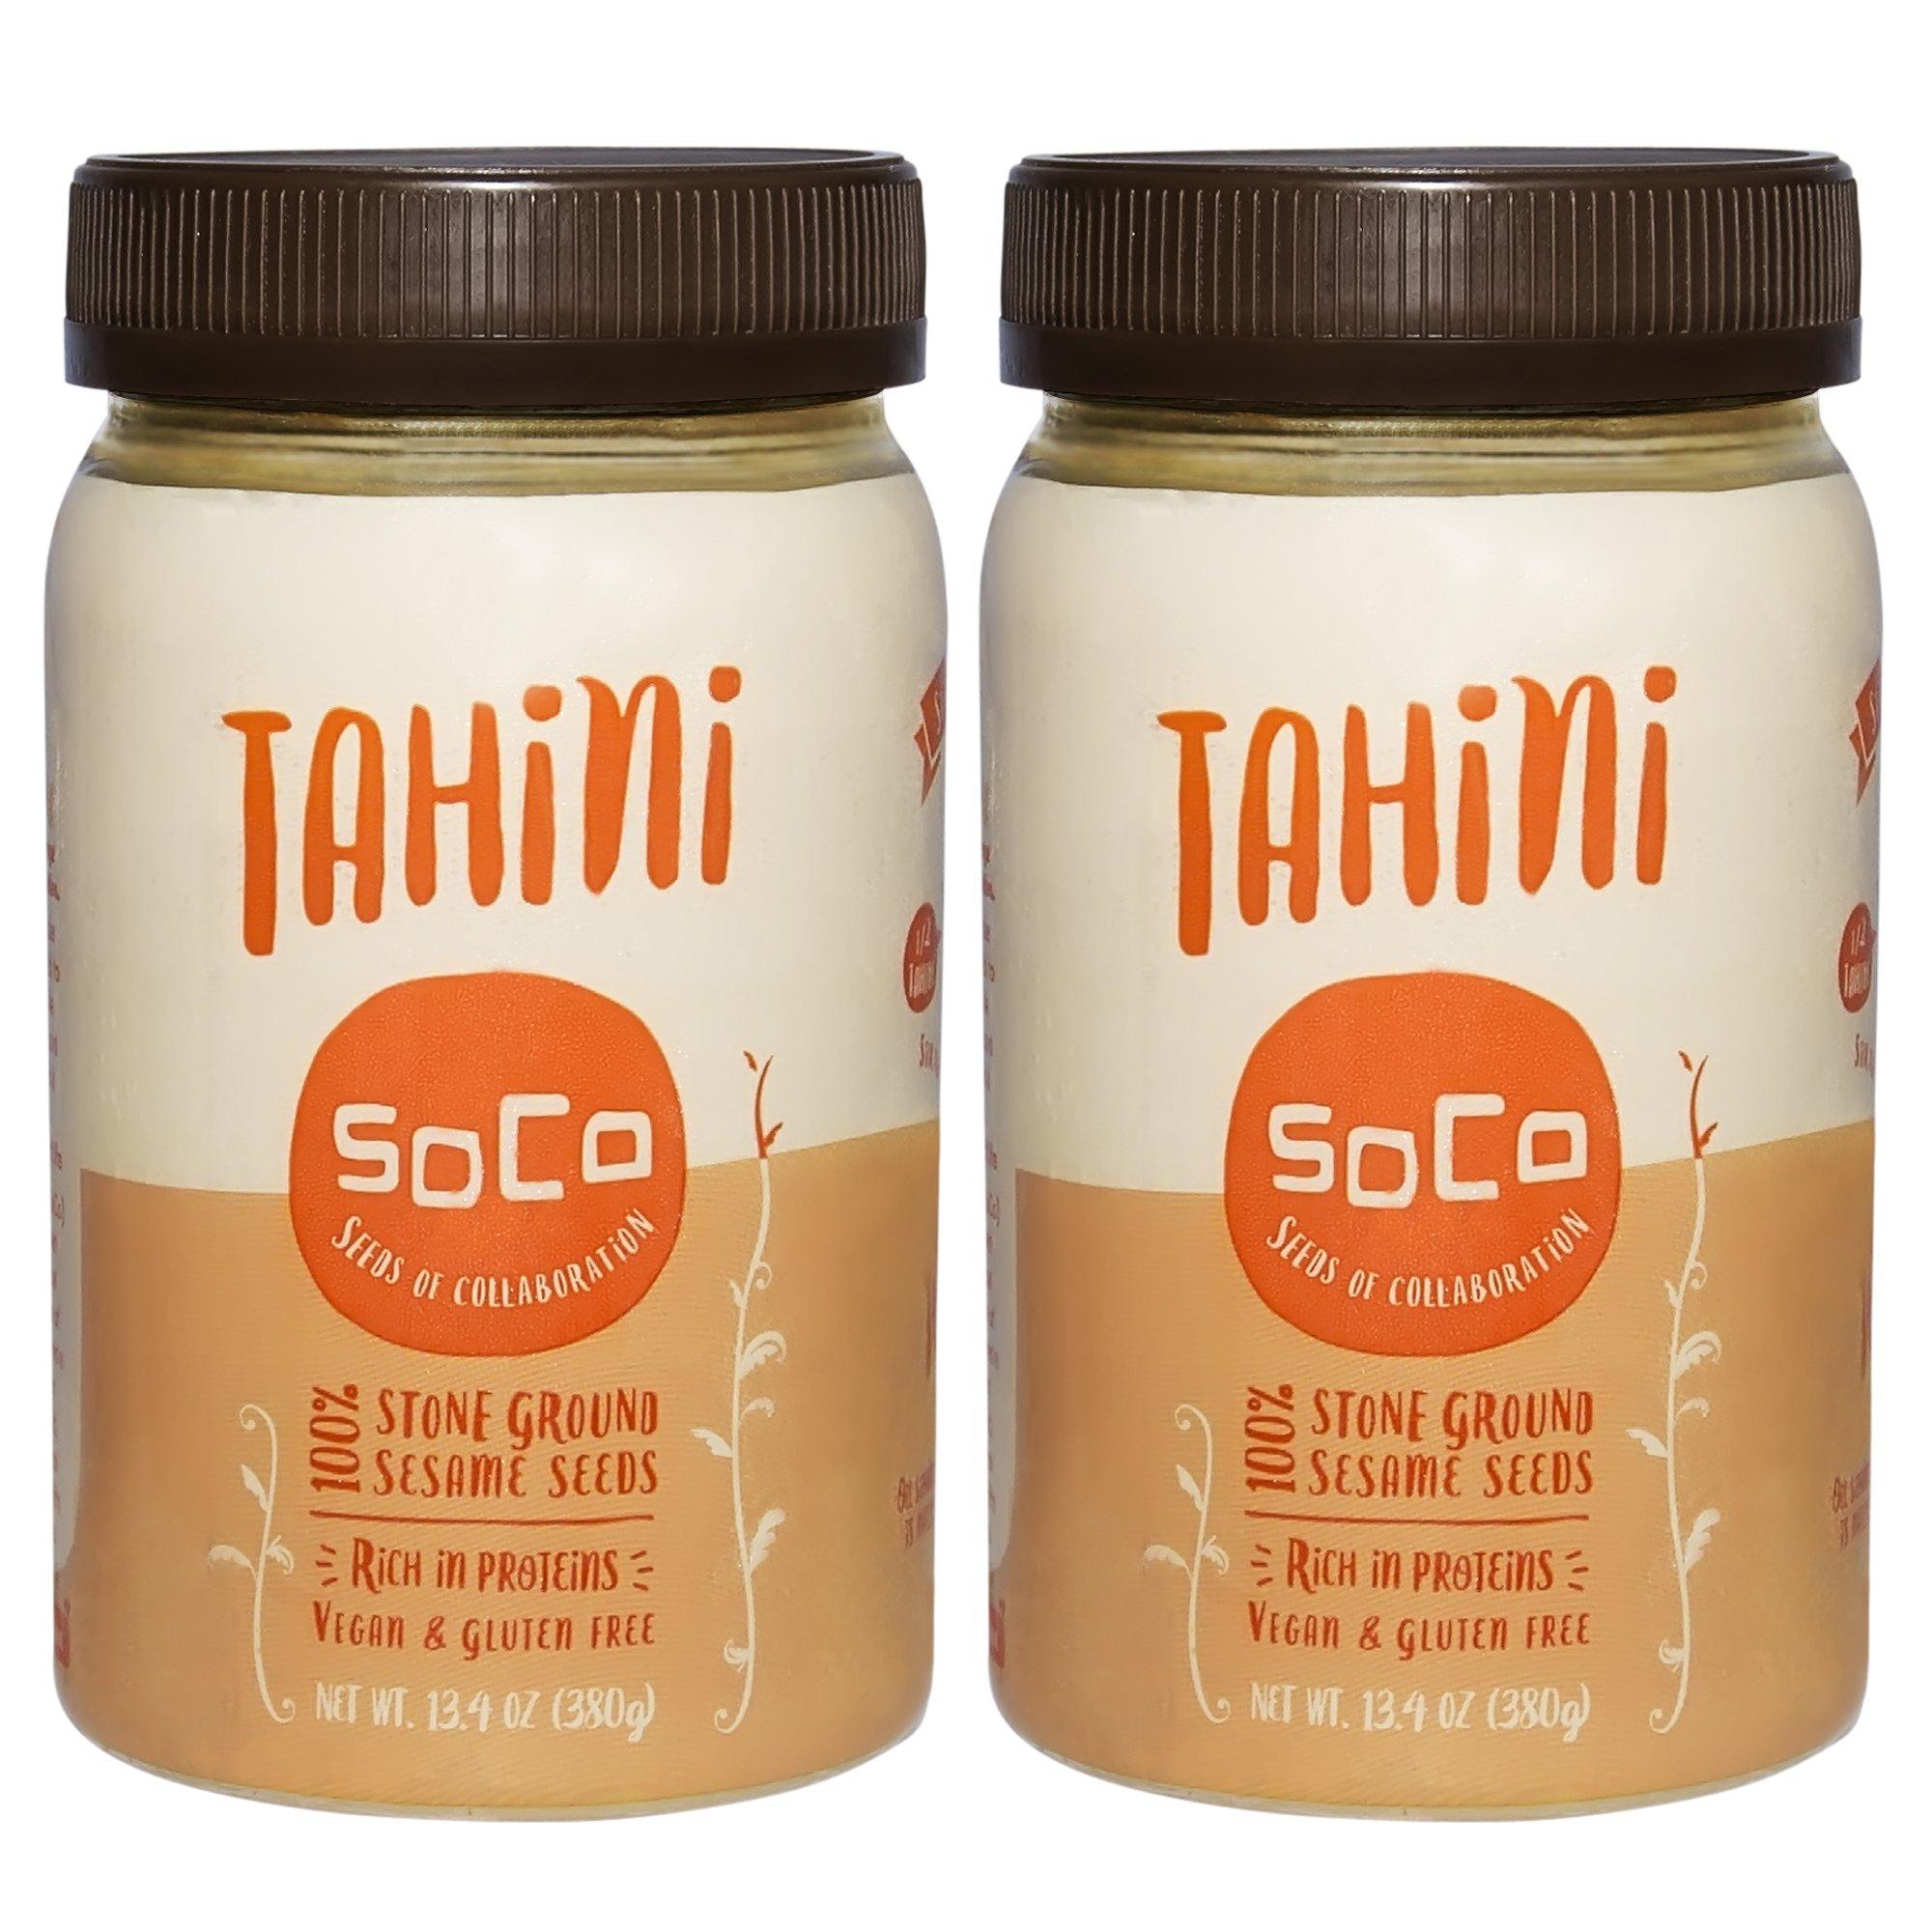 SoCo 100% Pure Premium Kosher Tahini - All Natural, Stone-Ground, Toasted, Vegan, Paleo, Gluten-Free, 26 Ounces (2 Pack) - We Help Students!